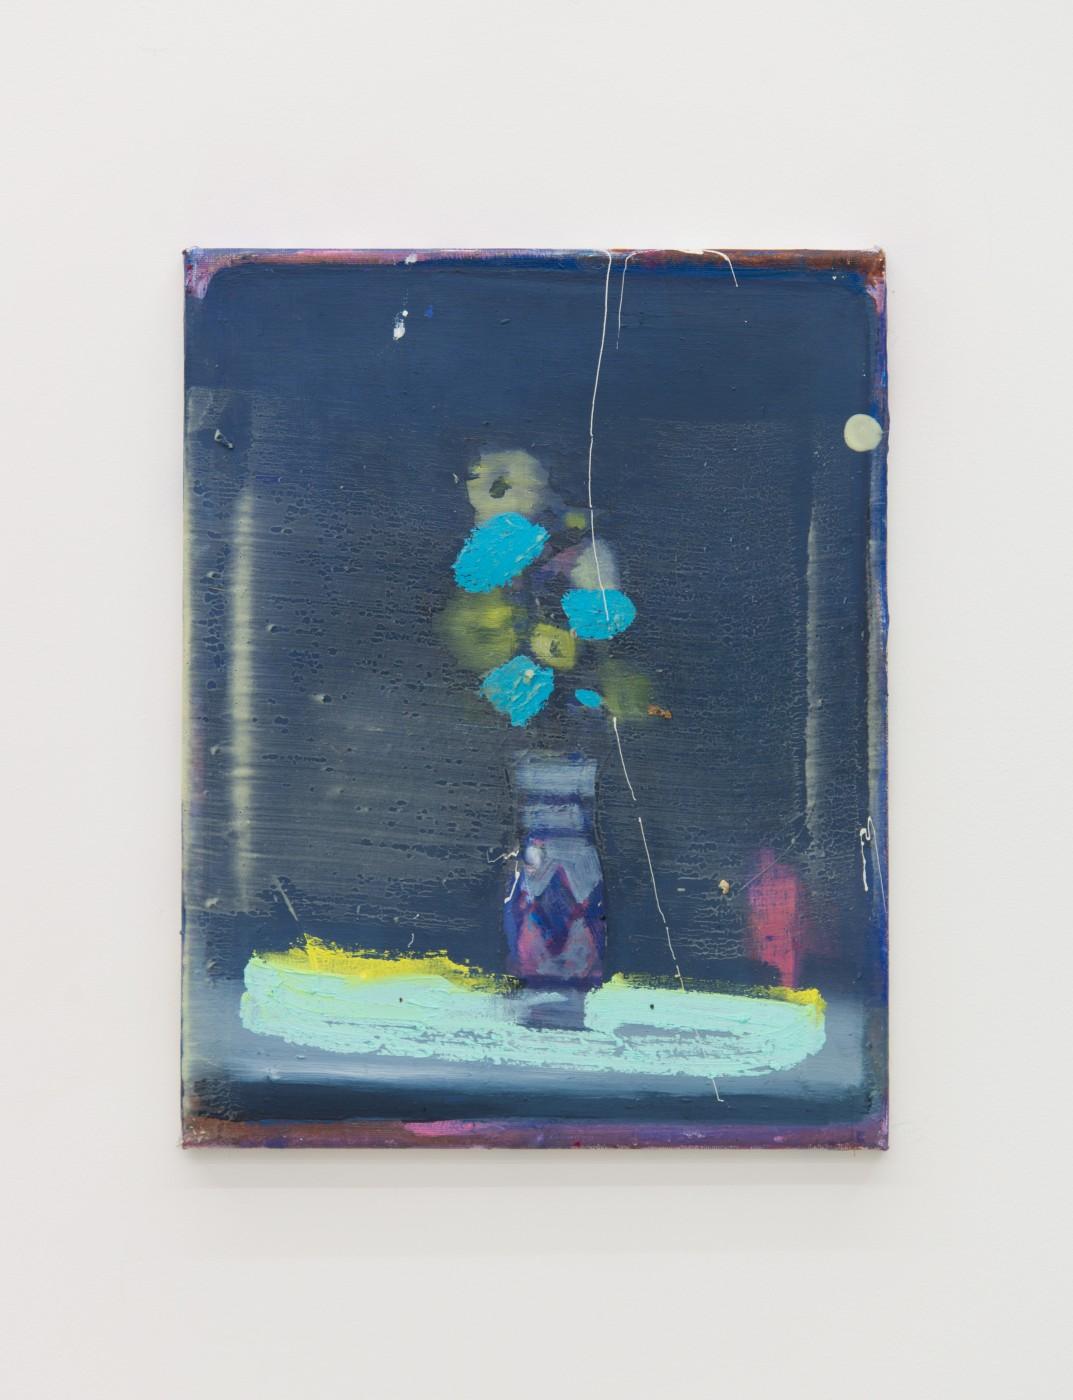 WALLFLOWERS, MALFLOWERS  Small Flower 3 , 2018  Oil on canvas  35 x 27,5 cm / 14 x 11 in  Nathan Zeidman